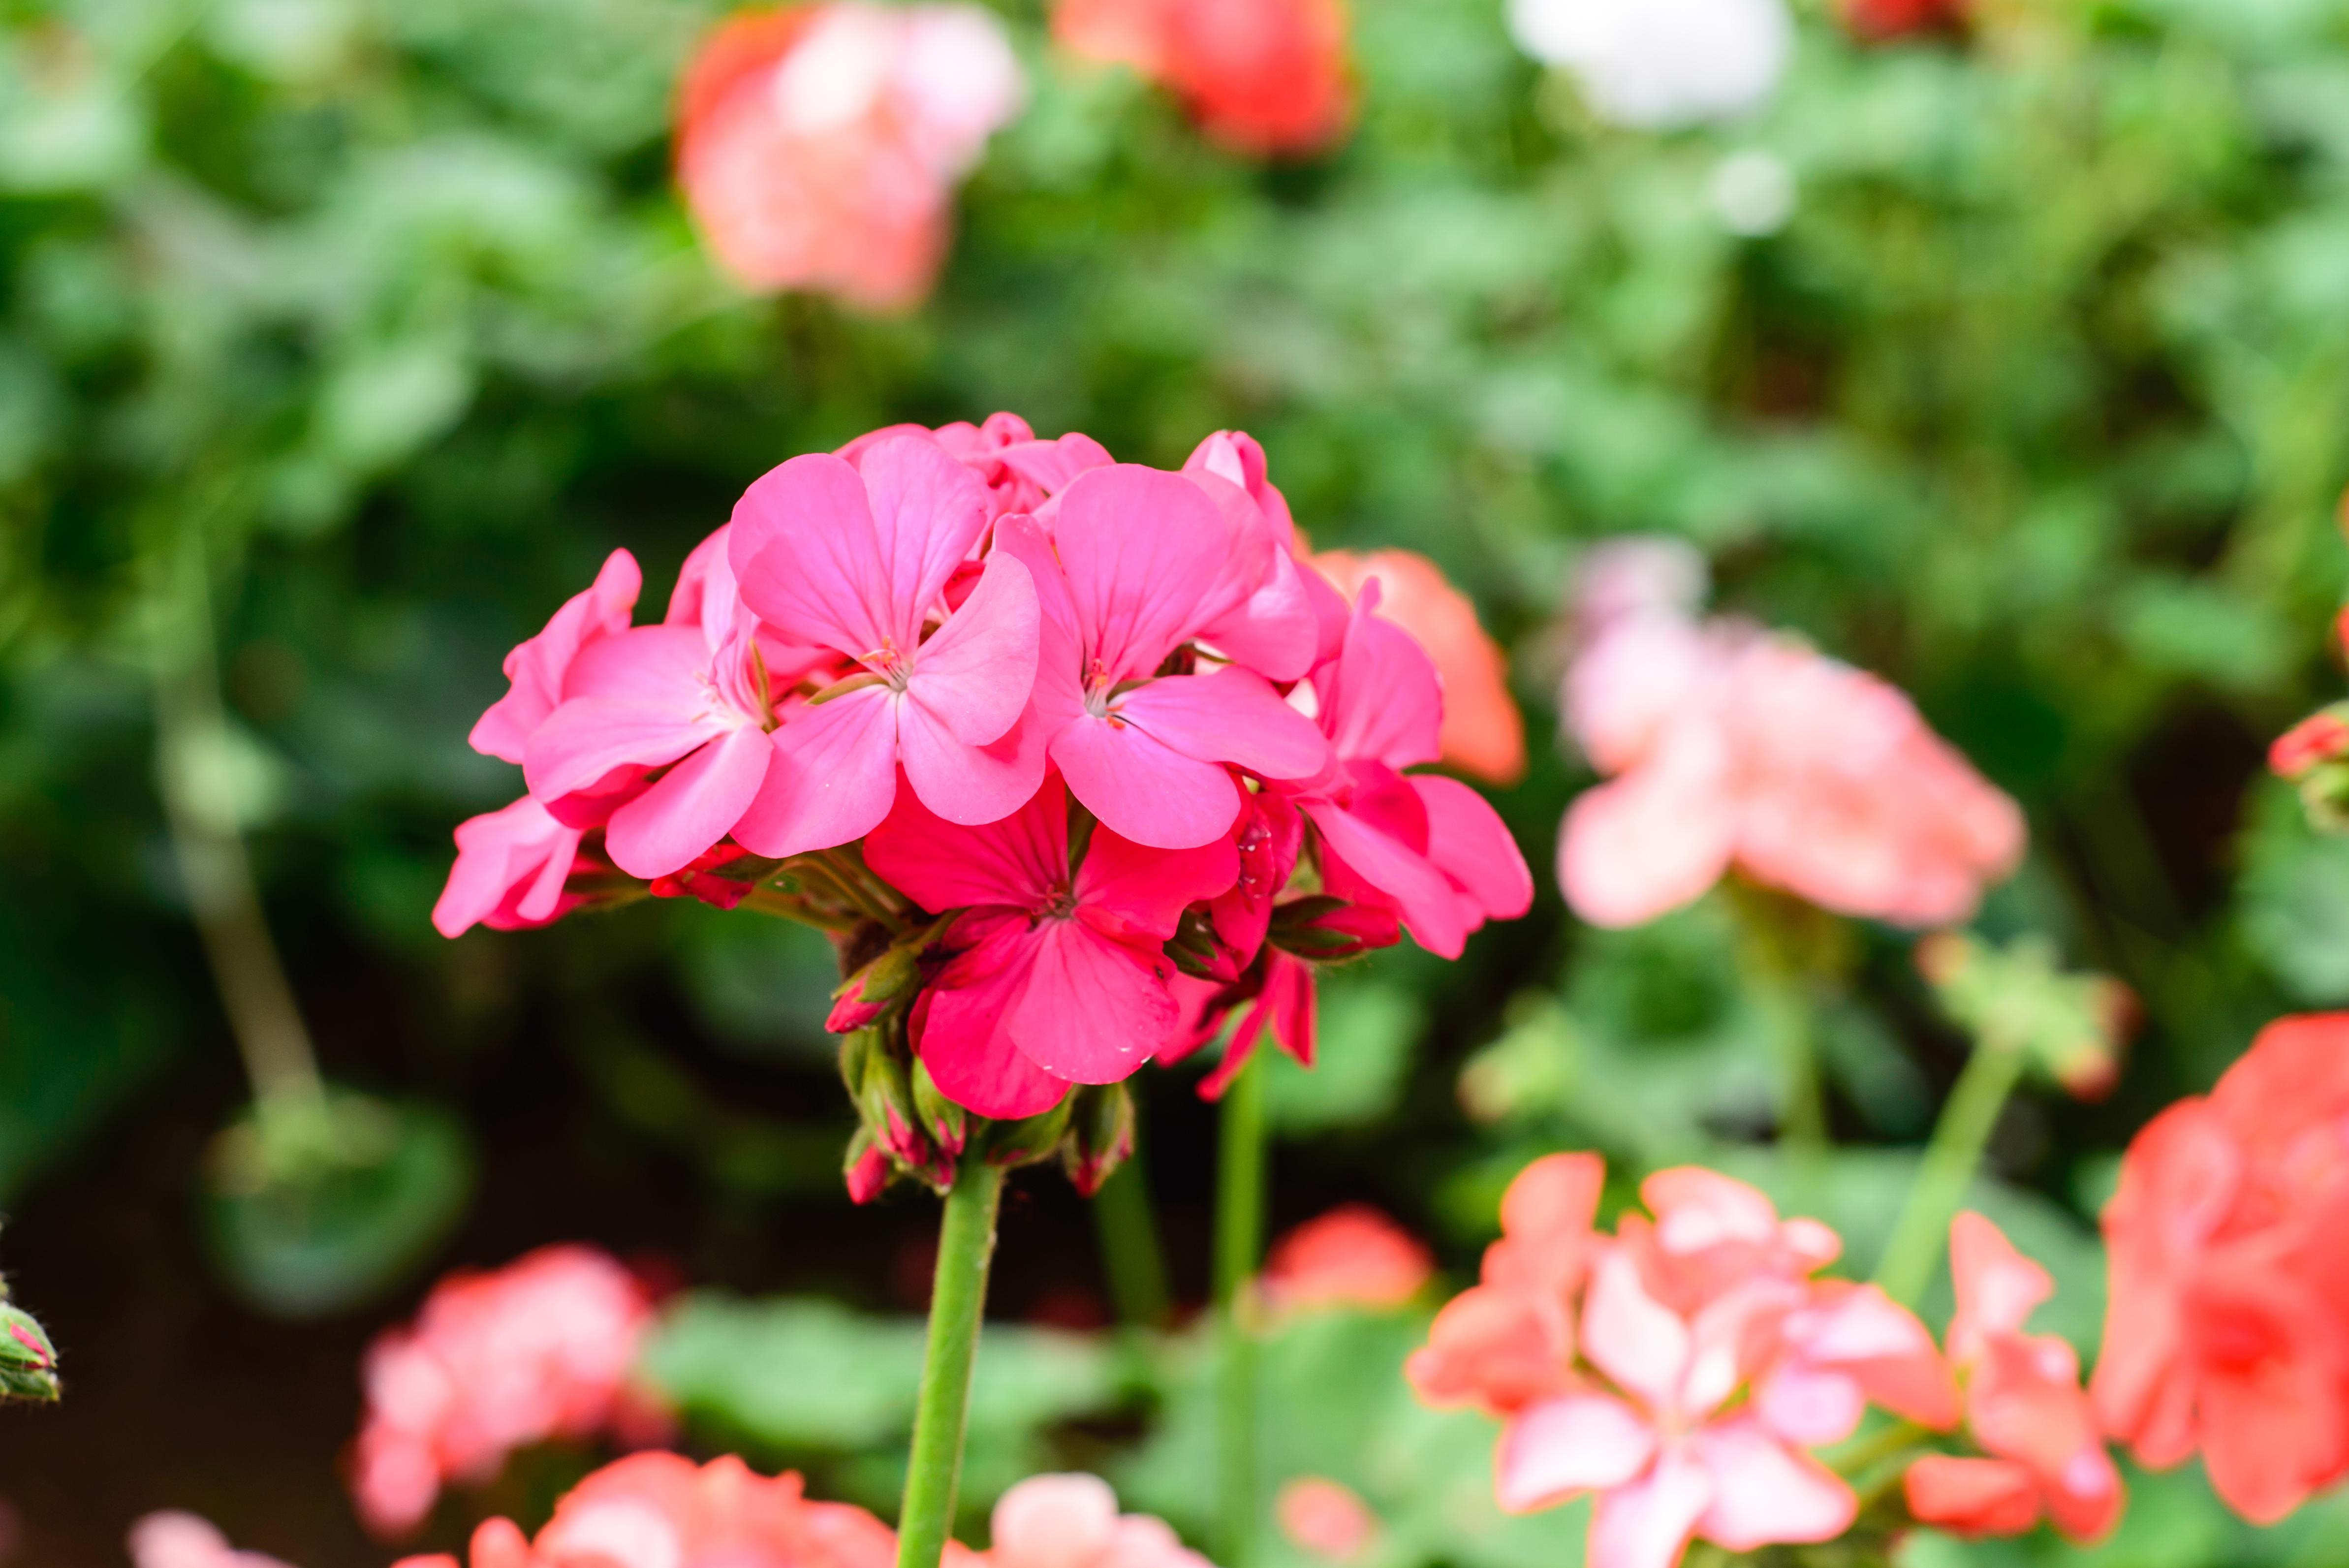 Images Gratuites : jardin, jardins, fleur rose, la nature ...